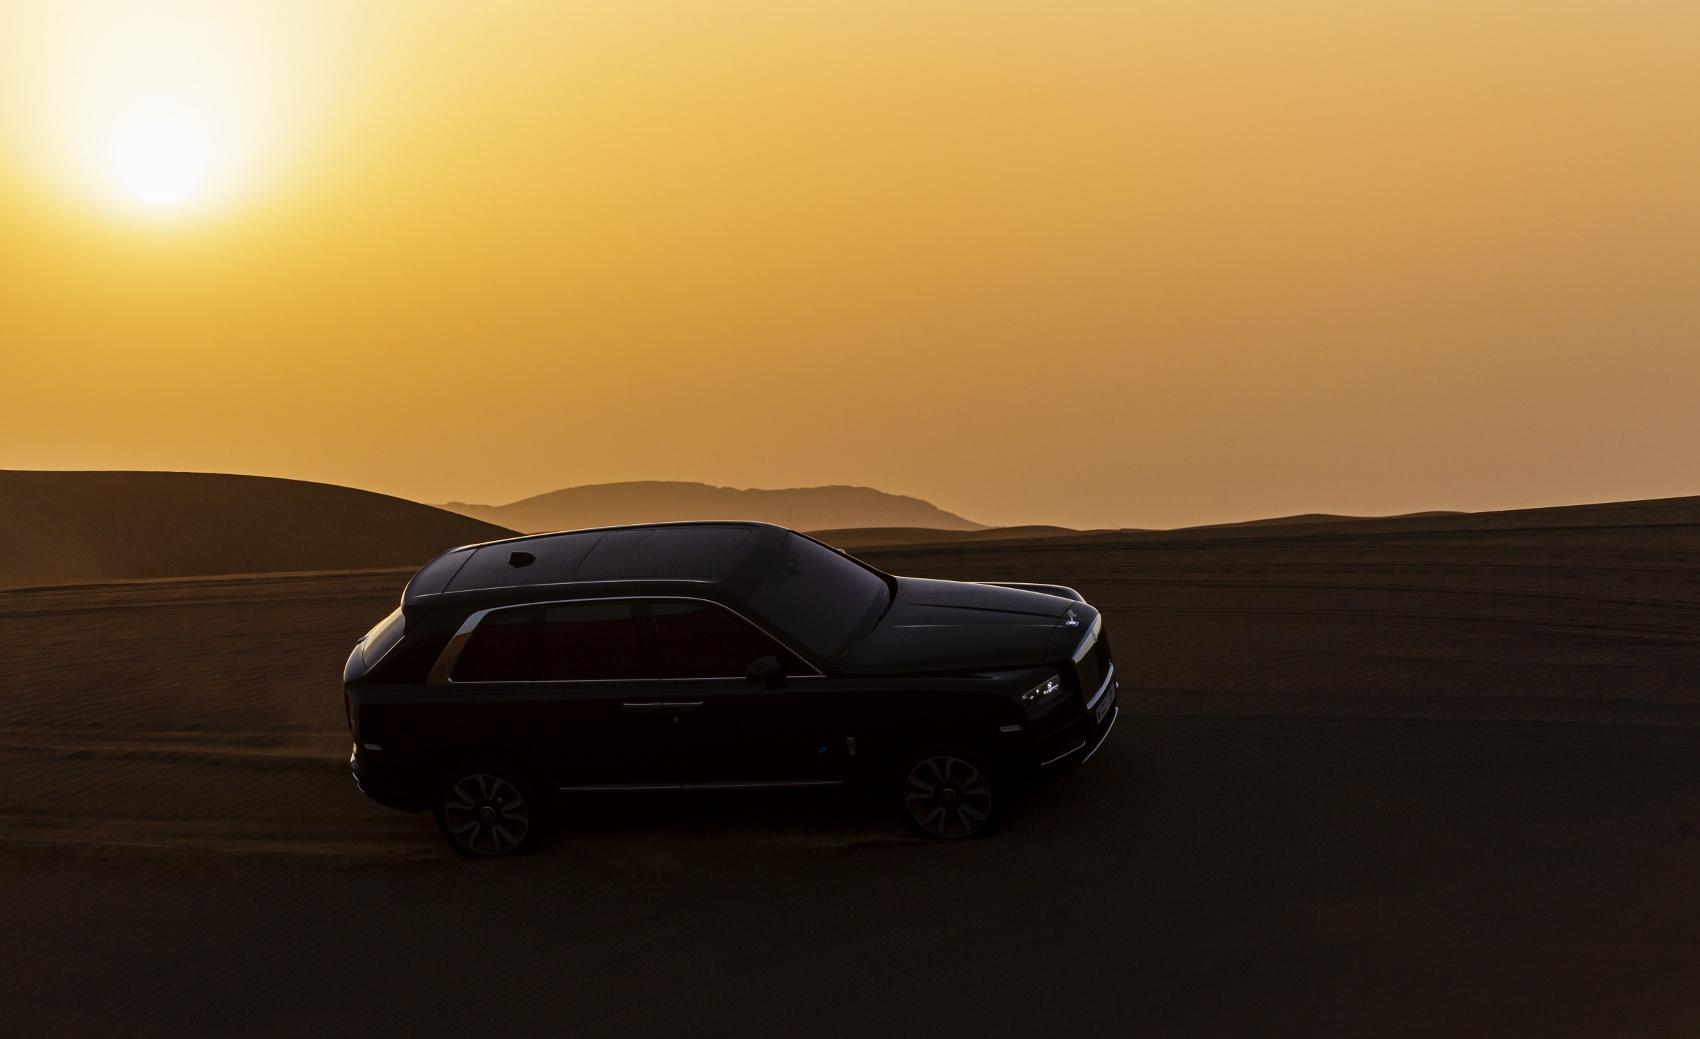 Rolls Royce Cullinan sa predviedol na púšti. Pozrite si foto aj video eLTHAT6PZo rolls-royce-cullina